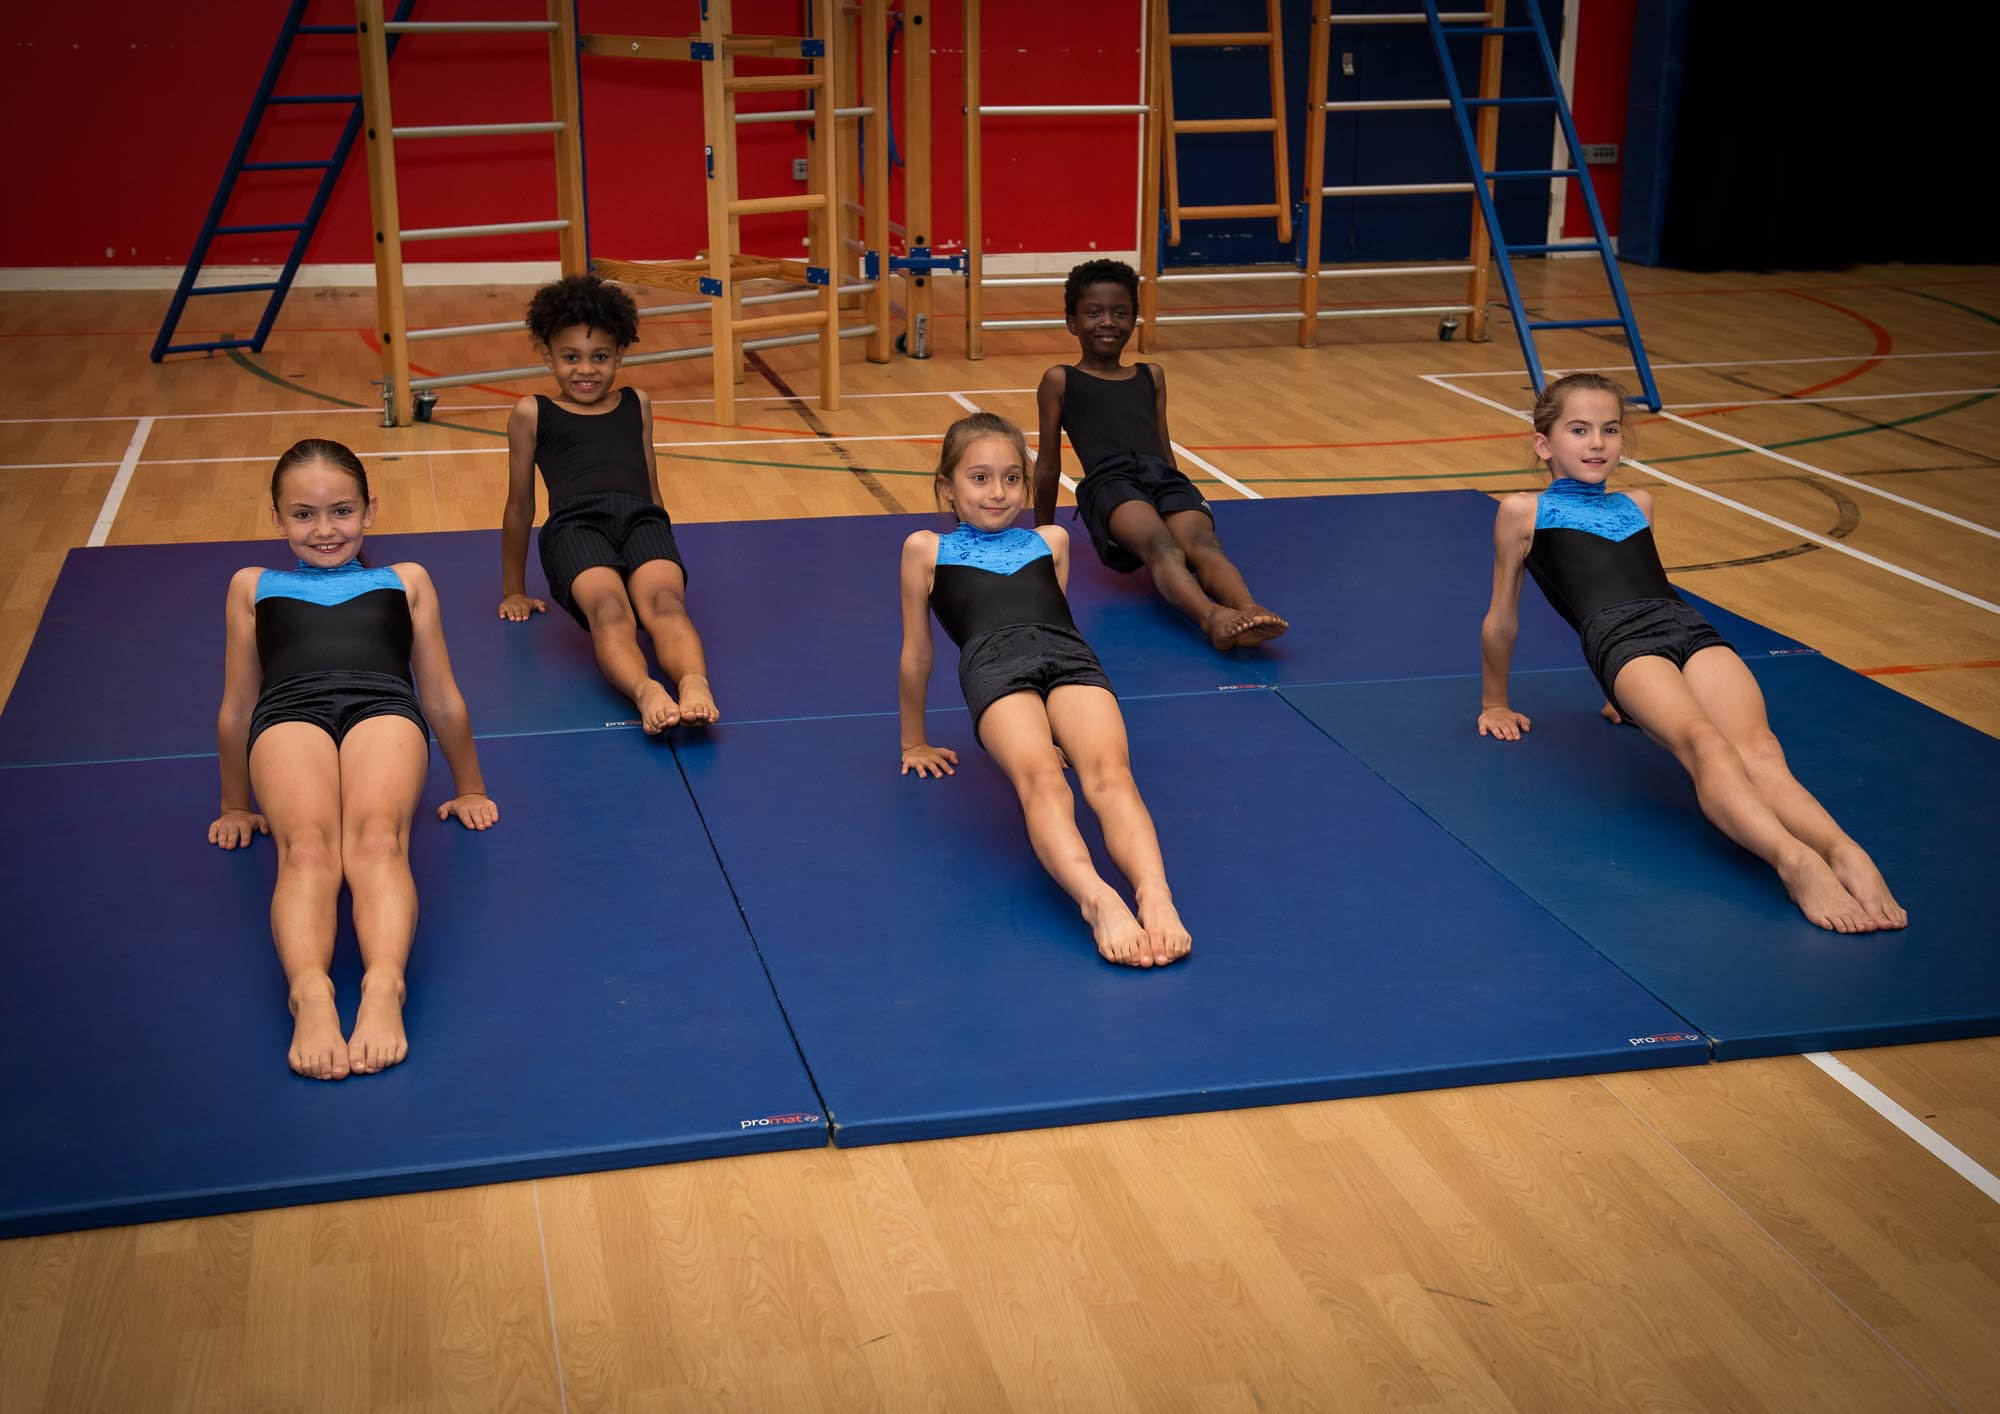 Gymnastic strength exercises on floor